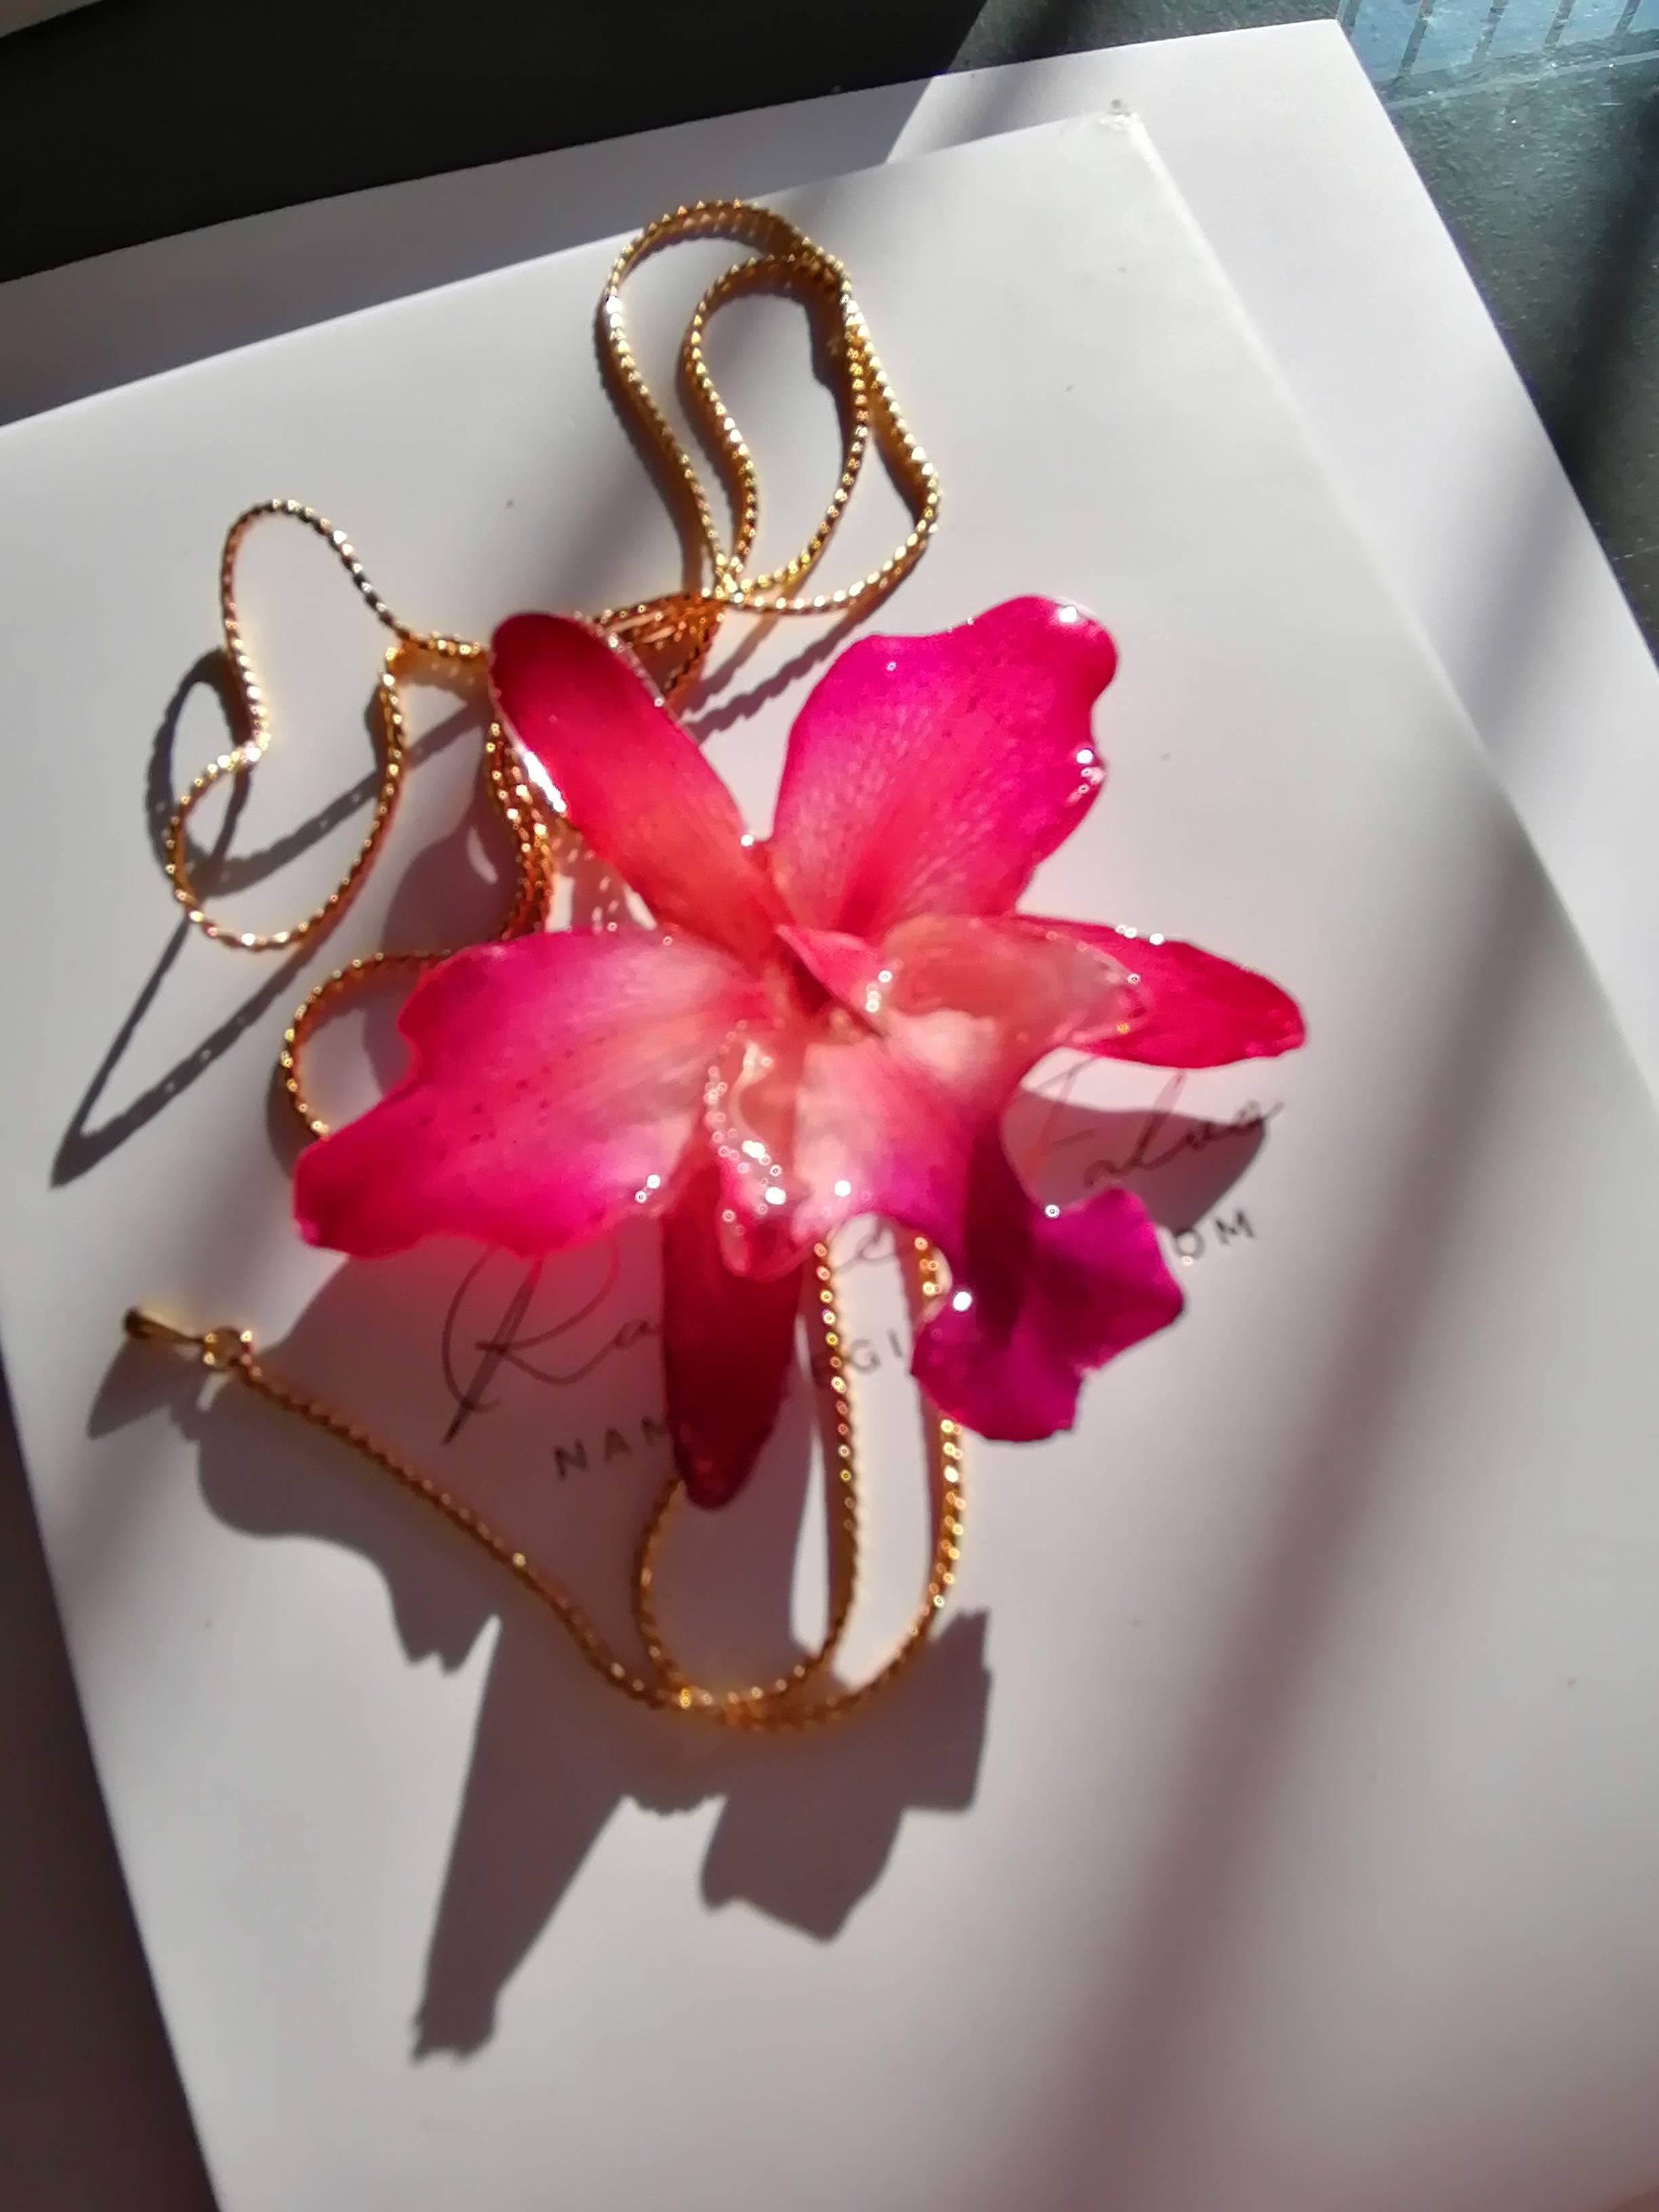 Gioielli di orchidee naturali inglobate in resina